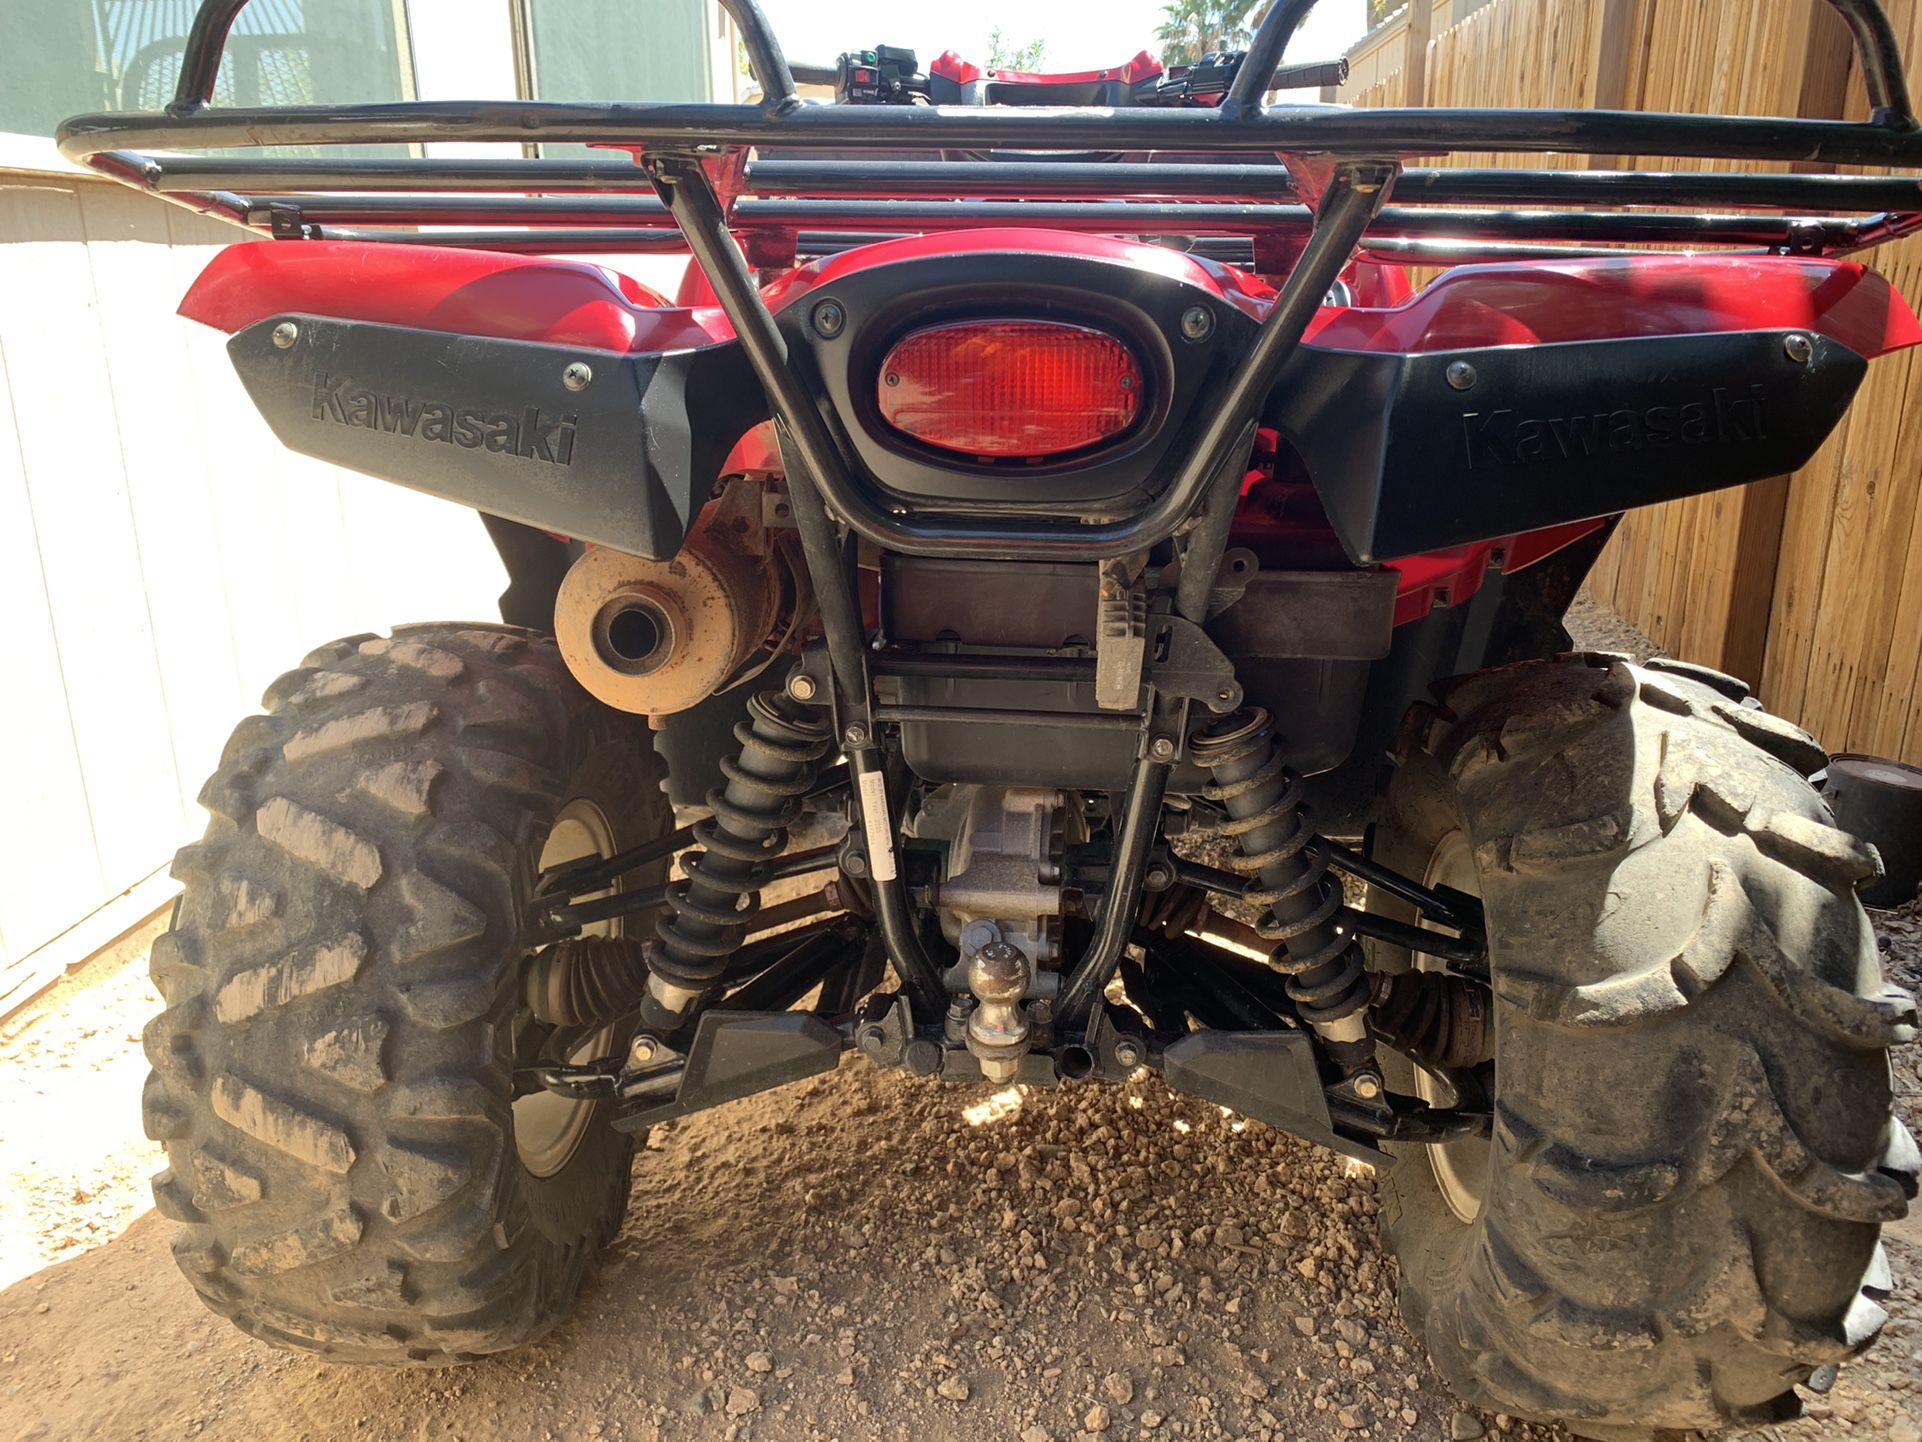 2005 Kawasaki brute force 750